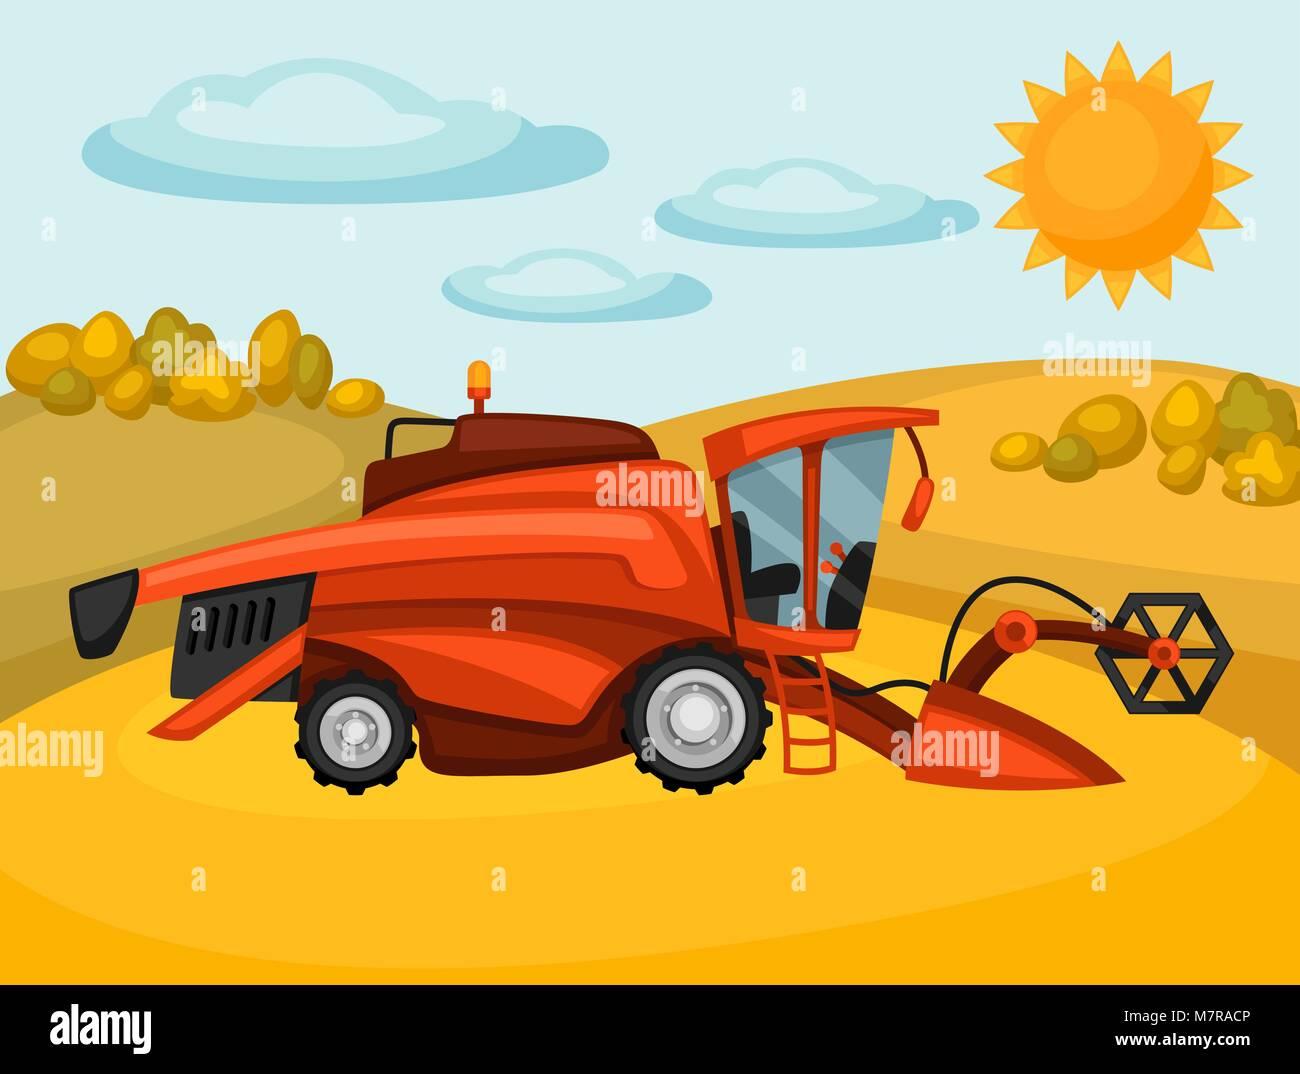 Combine harvester on wheat field. Agricultural illustration farm rural landscape - Stock Vector